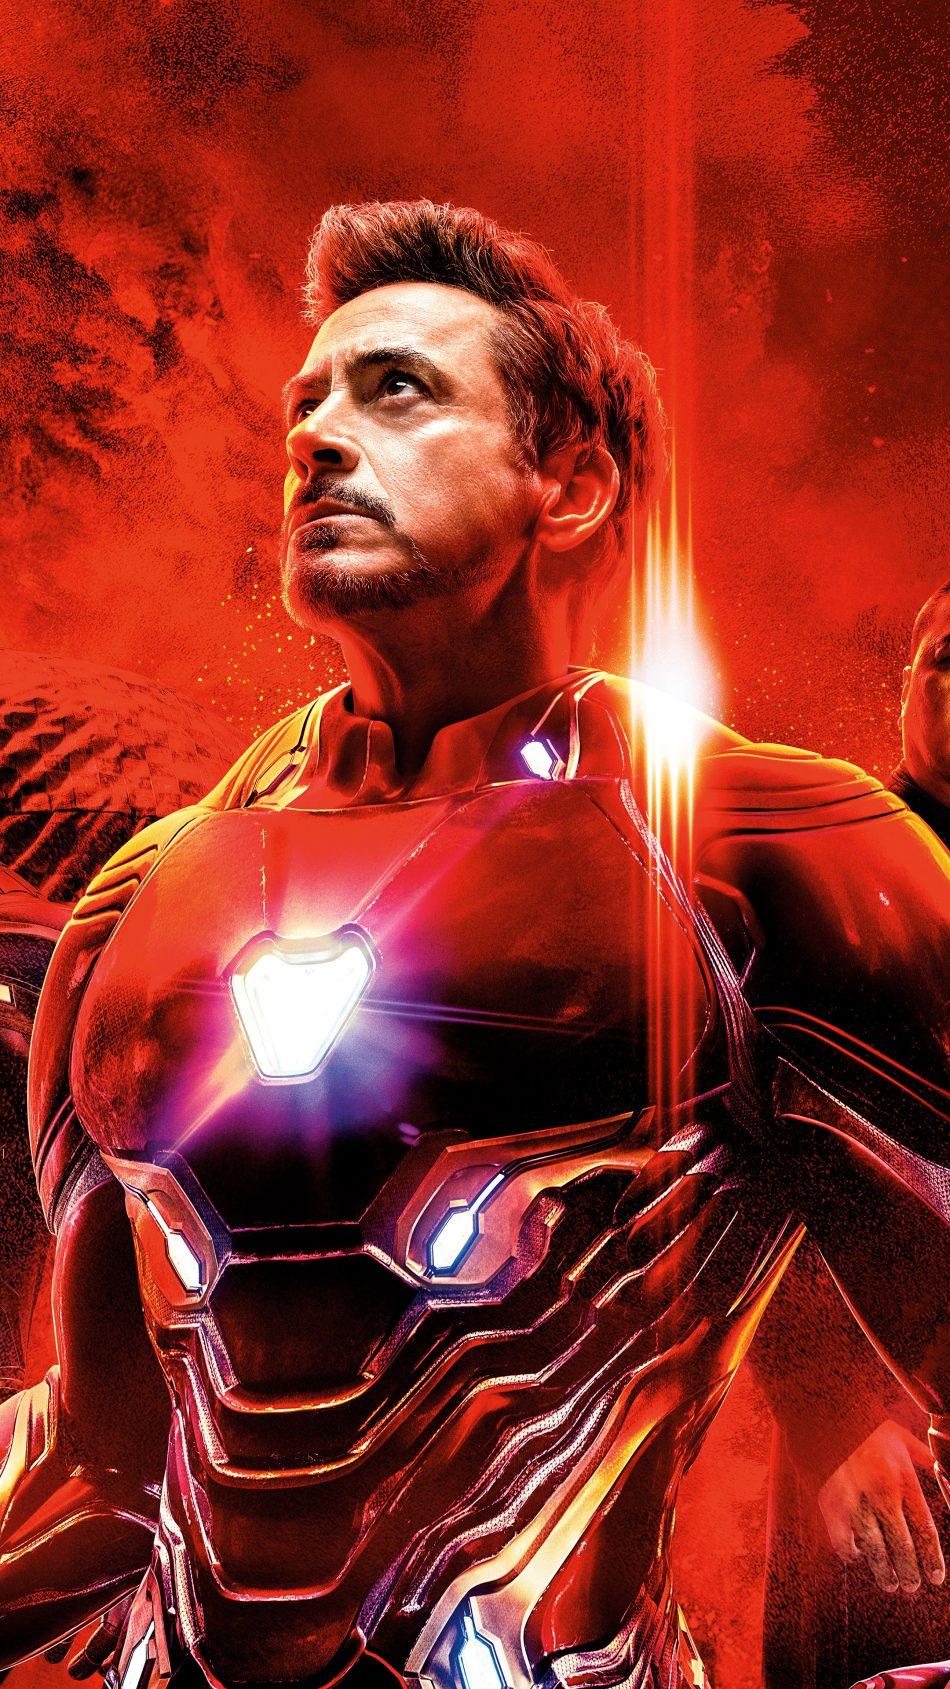 22 Avengers Endgame Iron Man Wallpapers On Wallpapersafari